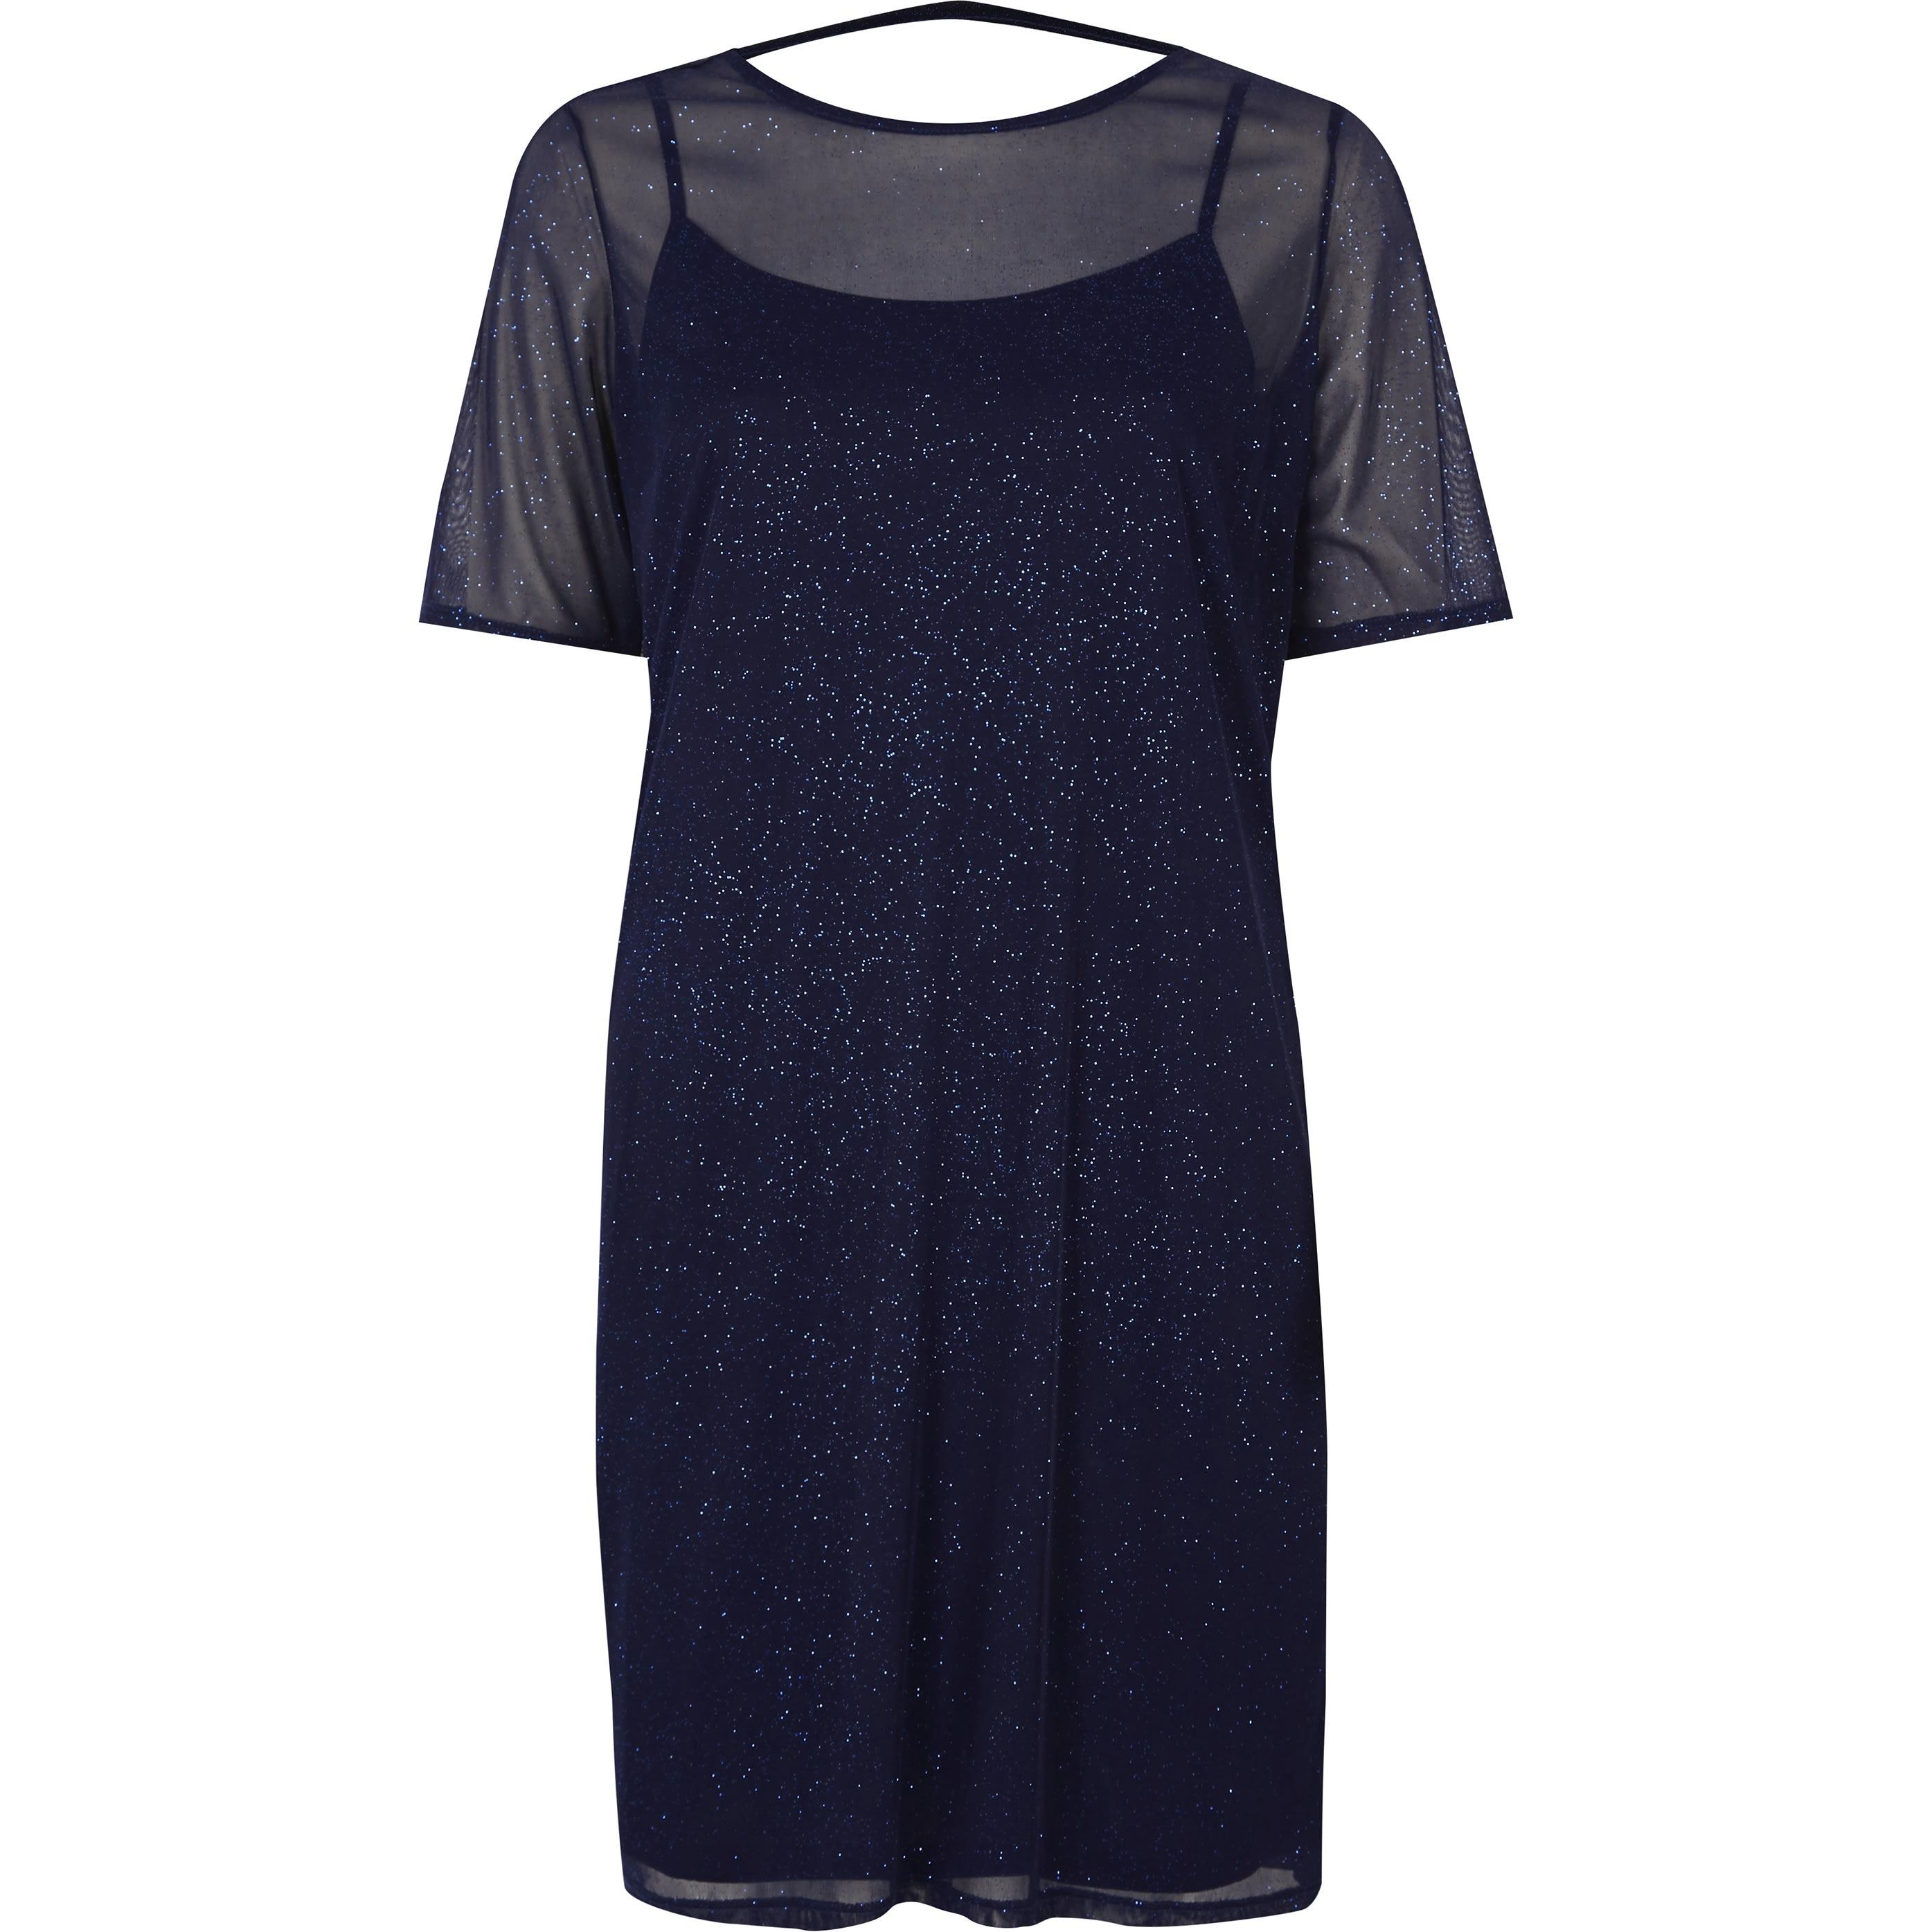 River Island Dark Blue glitter mesh T-shirt dress (6)